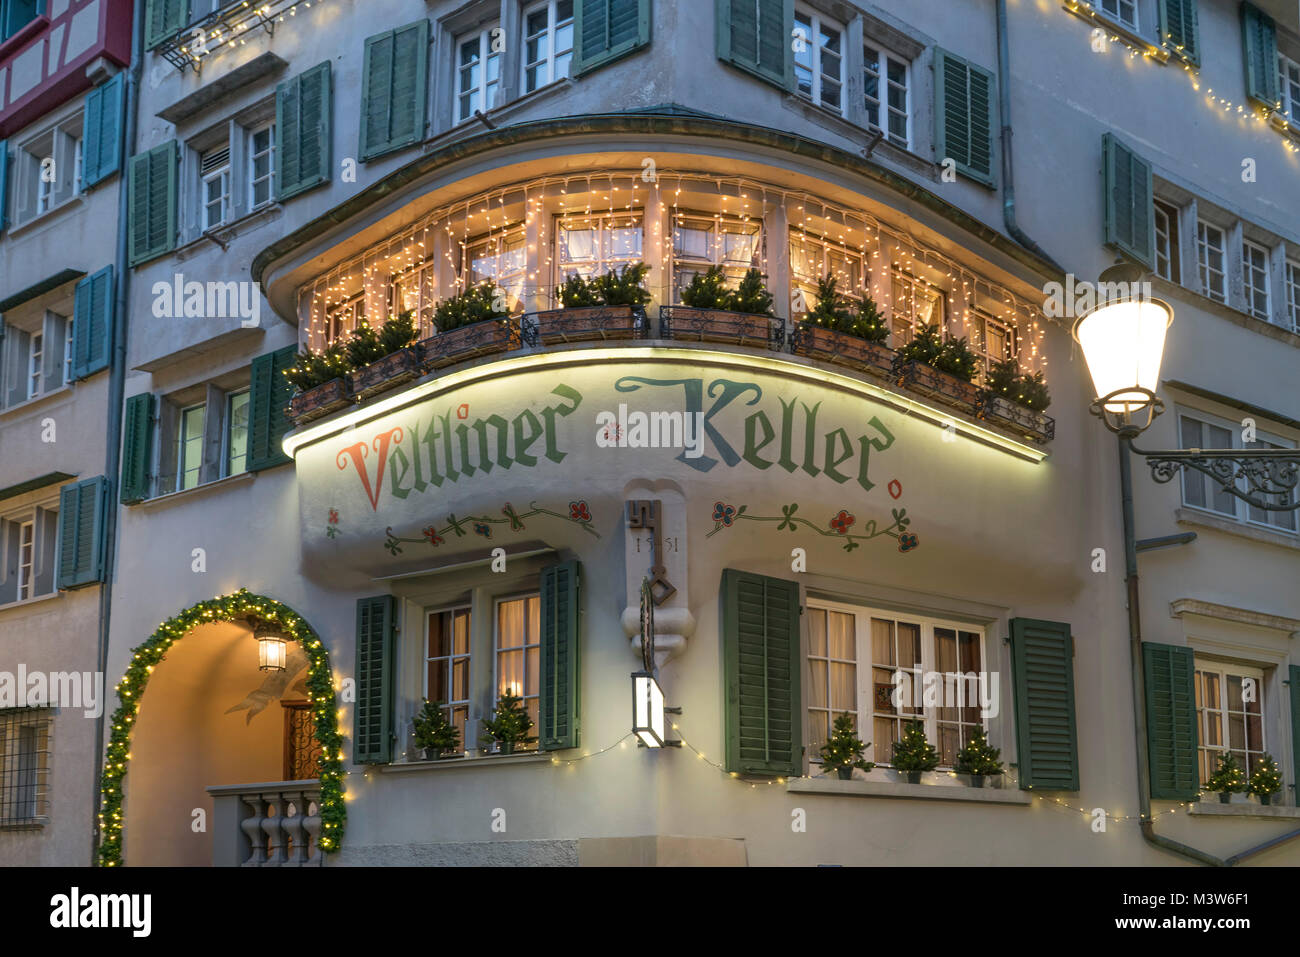 Veltliner Keller, old restaurant since 1551, old city center, Zurich, Switzerland - Stock Image